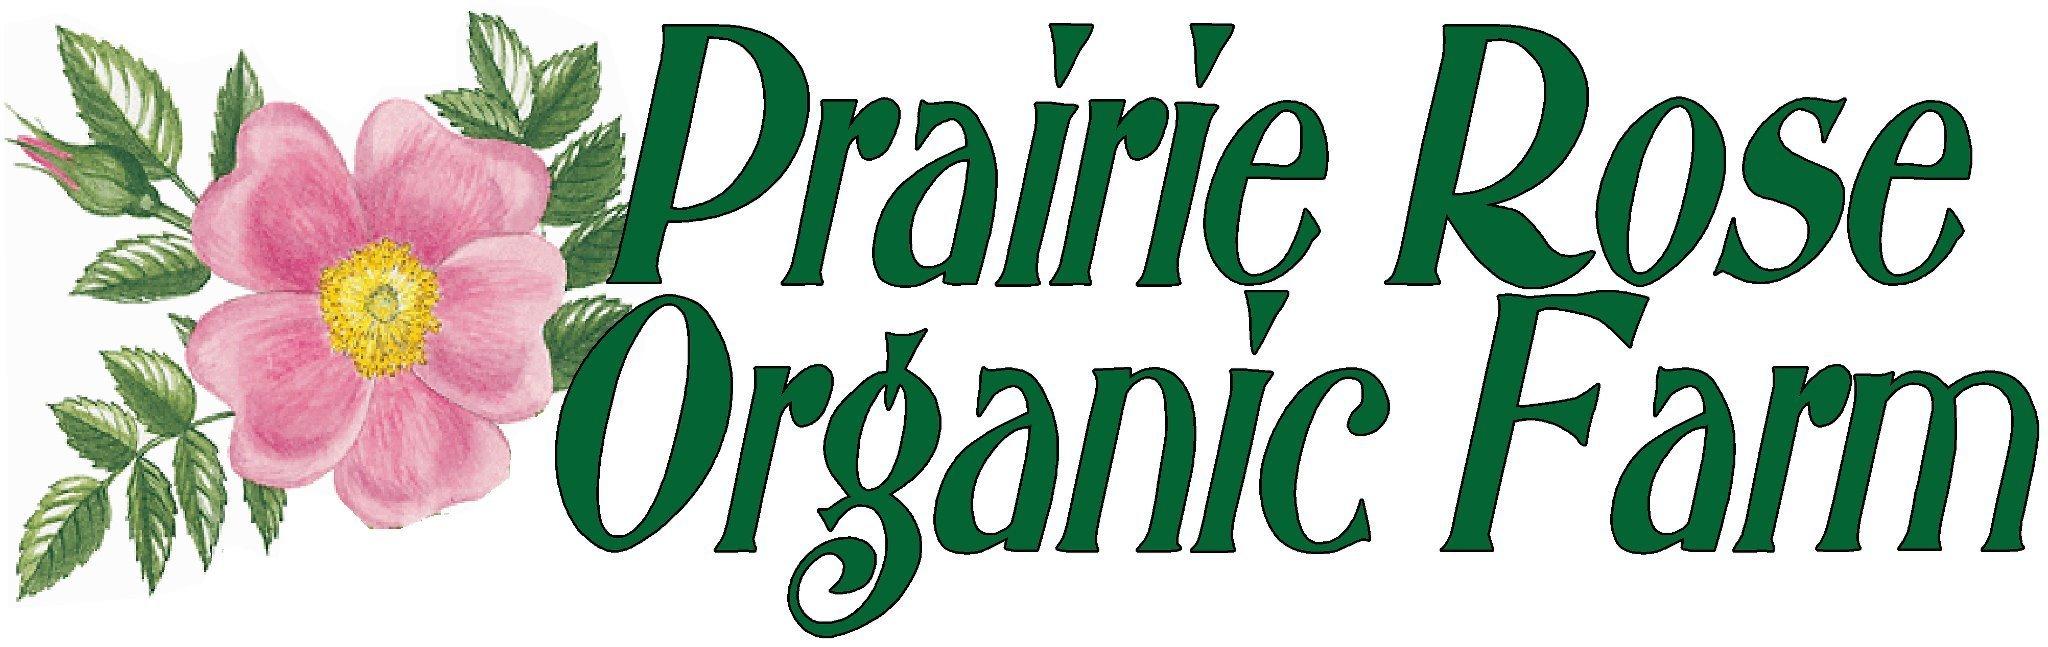 Prairie Rose Organic Sirloin Steak pro5